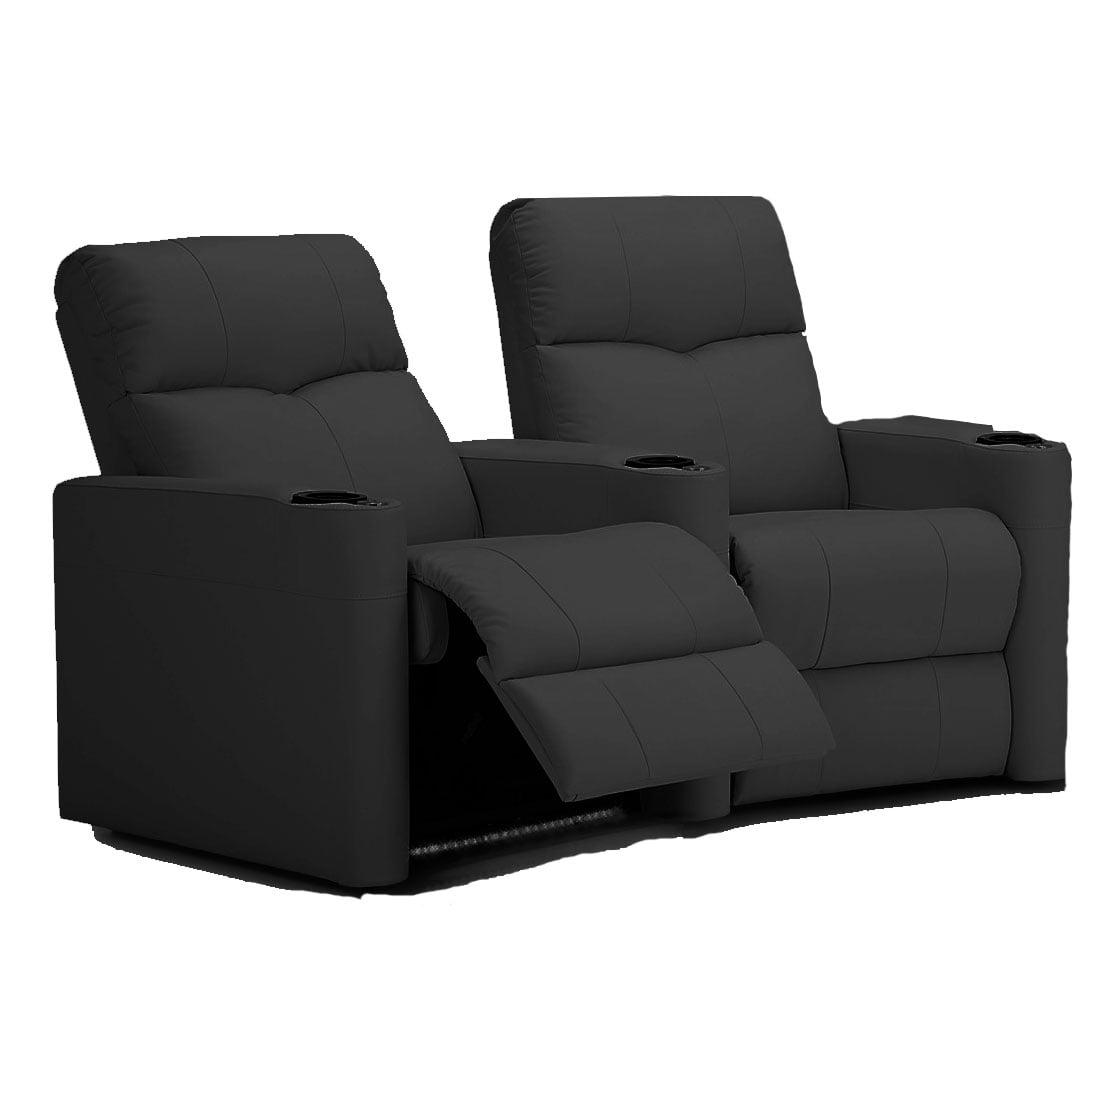 Palliser 41413 Techno 1e 3e Home Theater Power Recliner 2 Chair  # Meuble Tv Techno